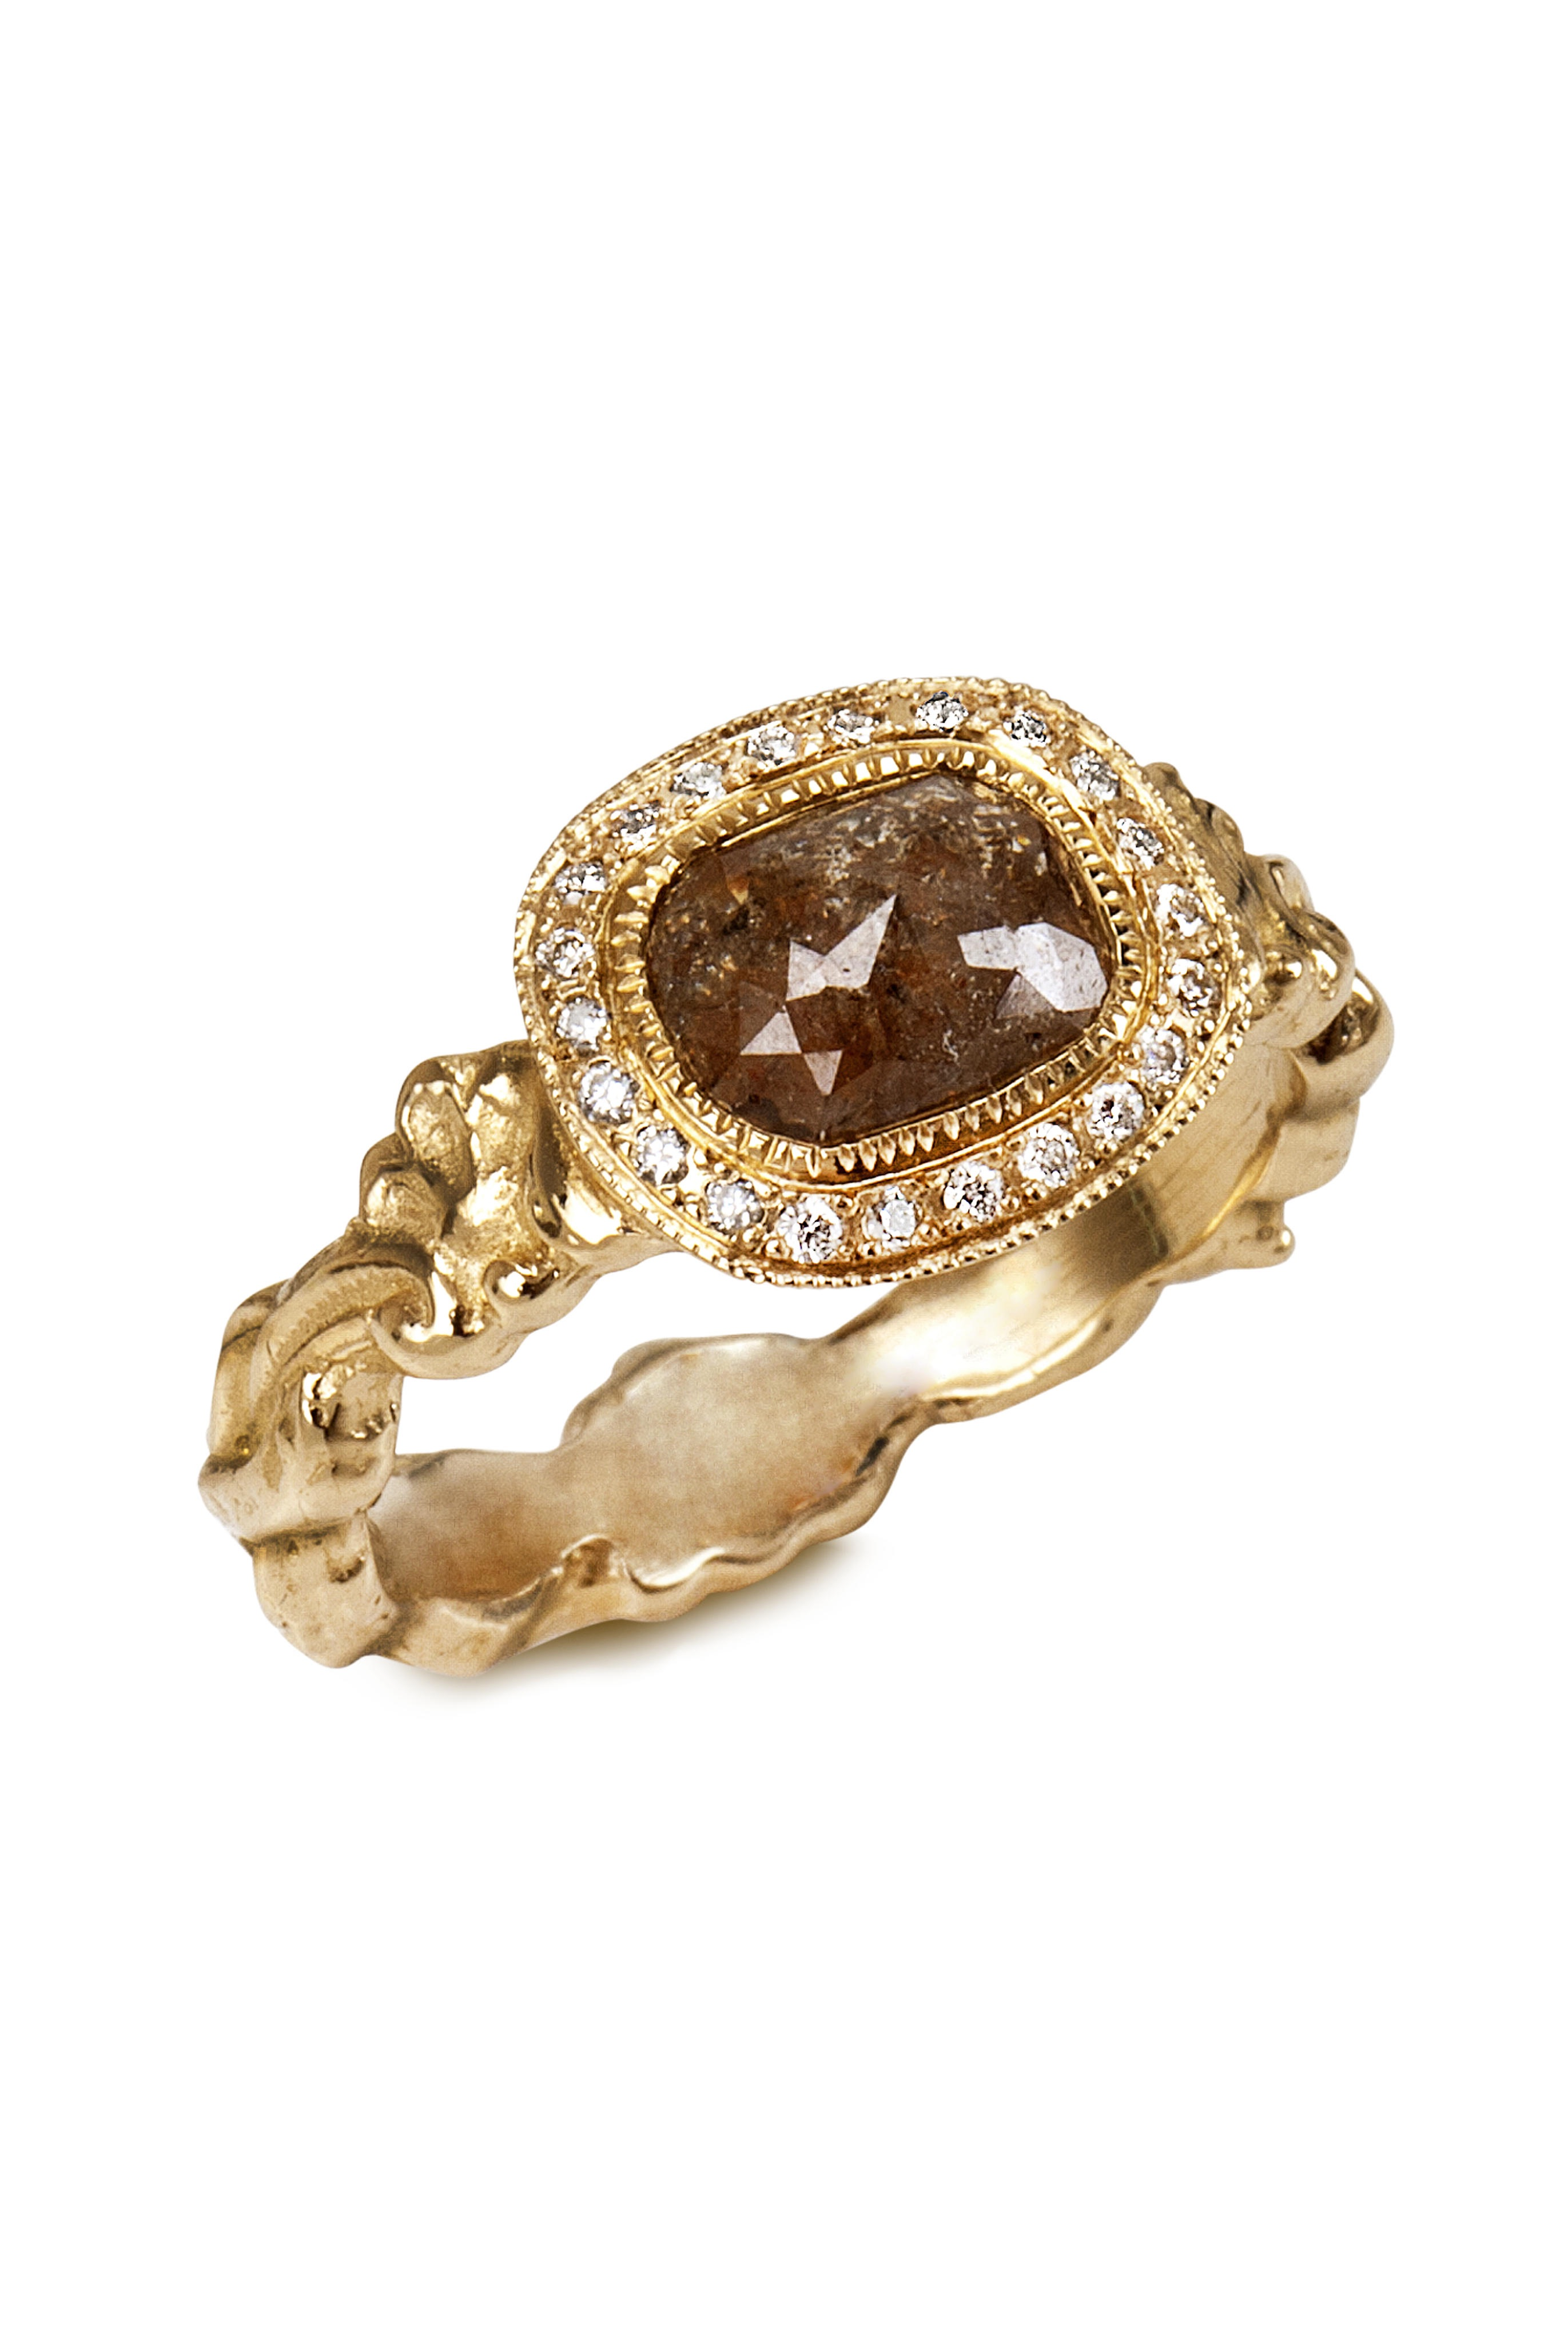 The Jewel - Just Jules - Lookbook - Brown Gold Ring